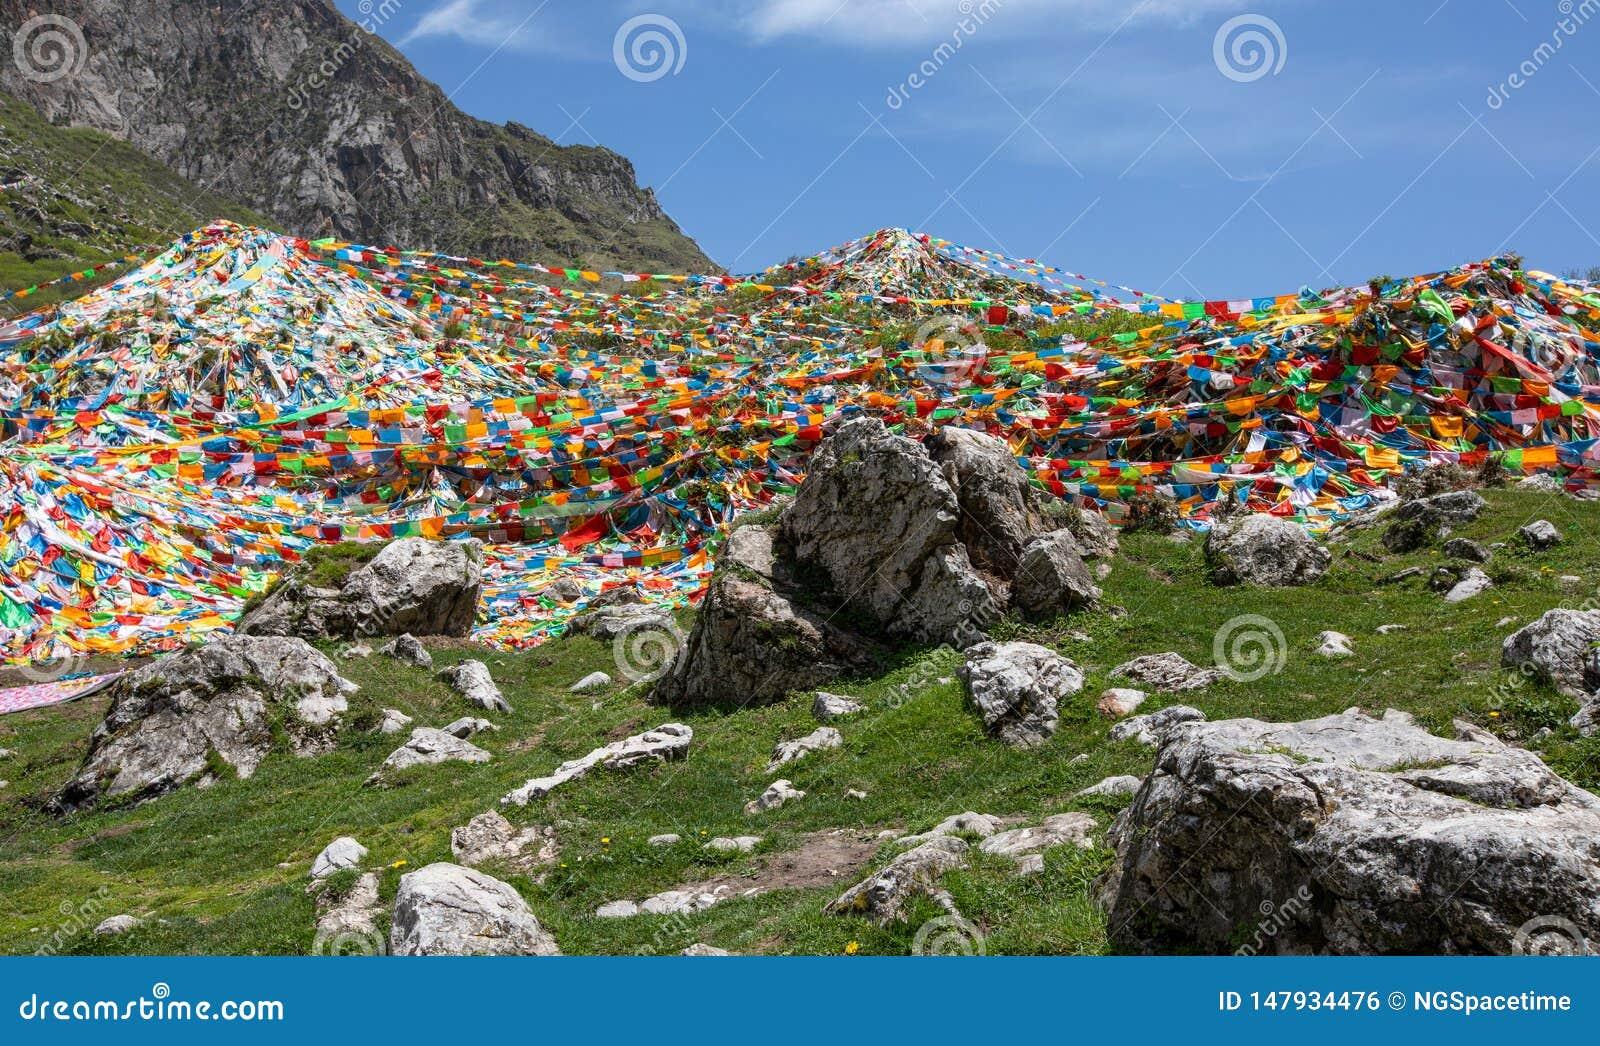 Tibetan prayer flags on the mountian